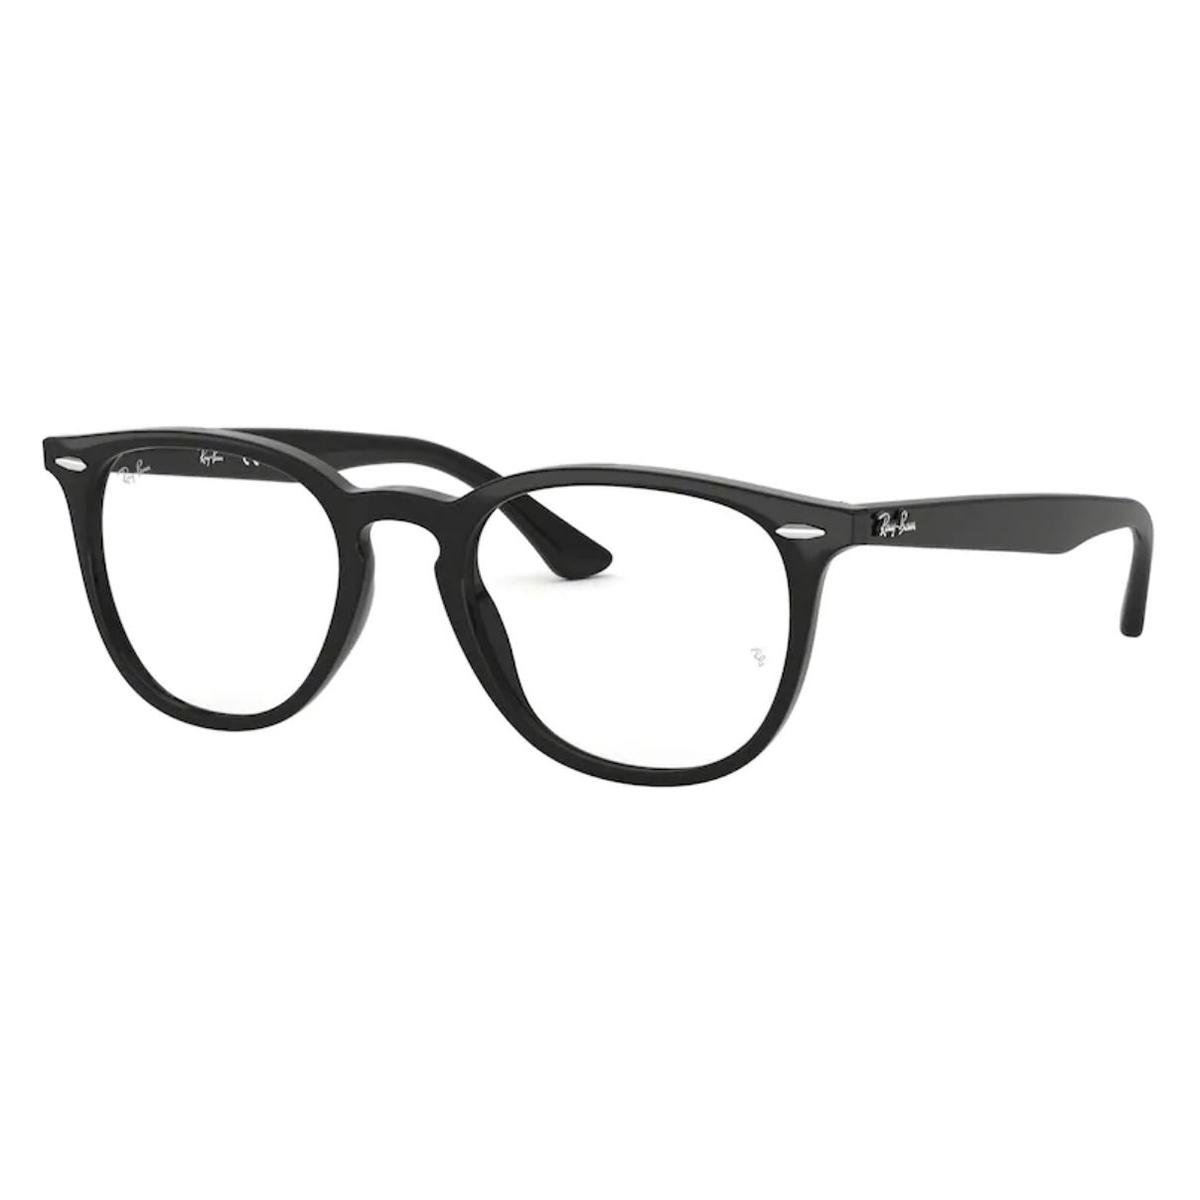 Óculos de Grau Ray Ban RX7159 Preto Brilho Tamanho 52